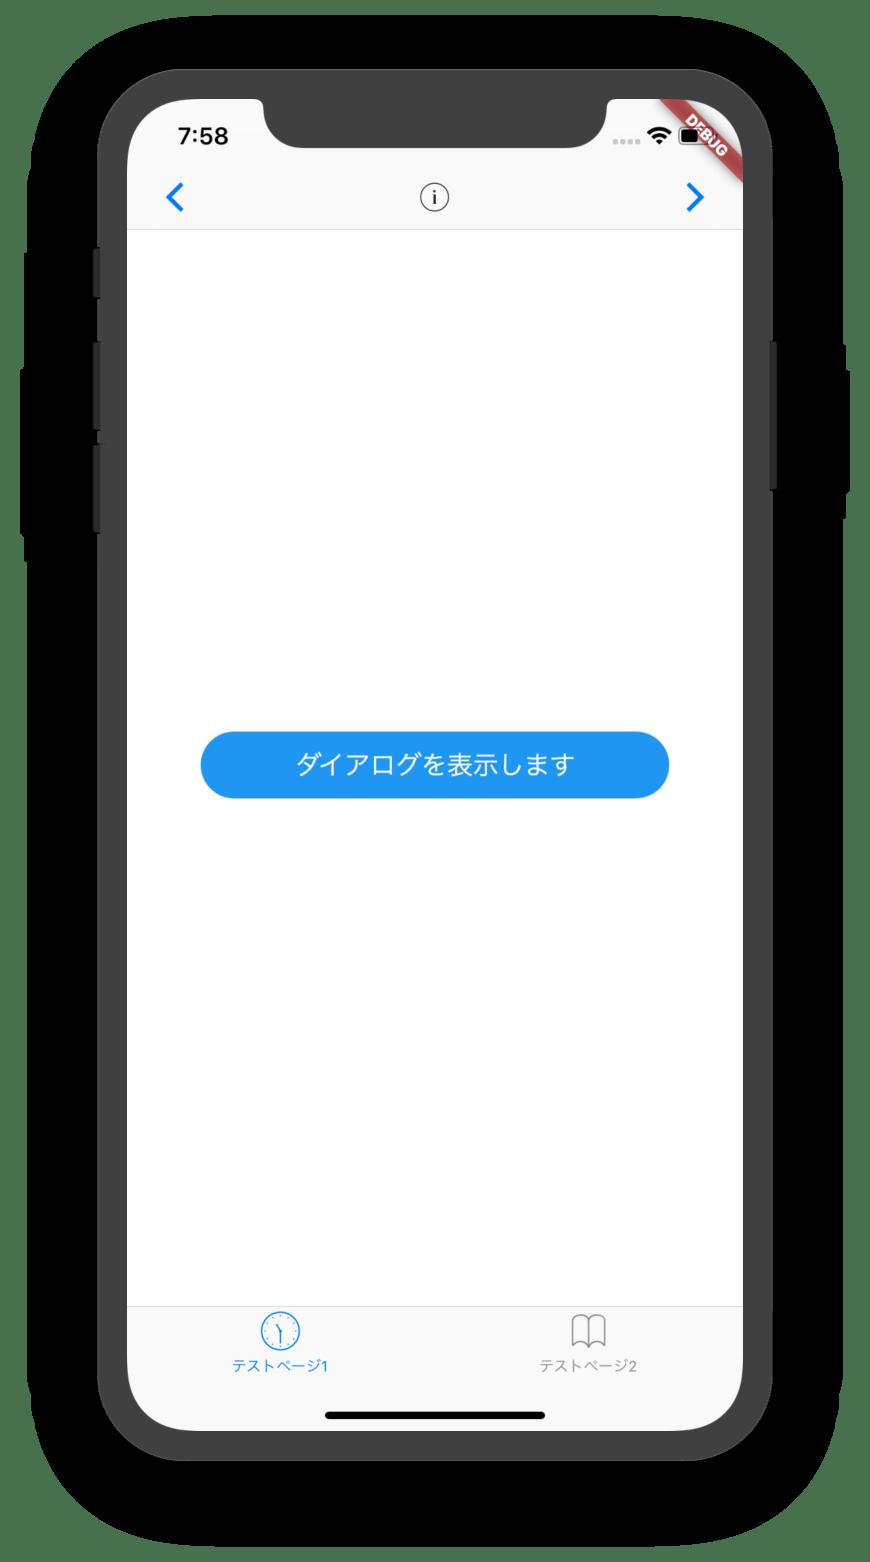 FlutterでCupertino UIのアプリを作ってみた - Qiita